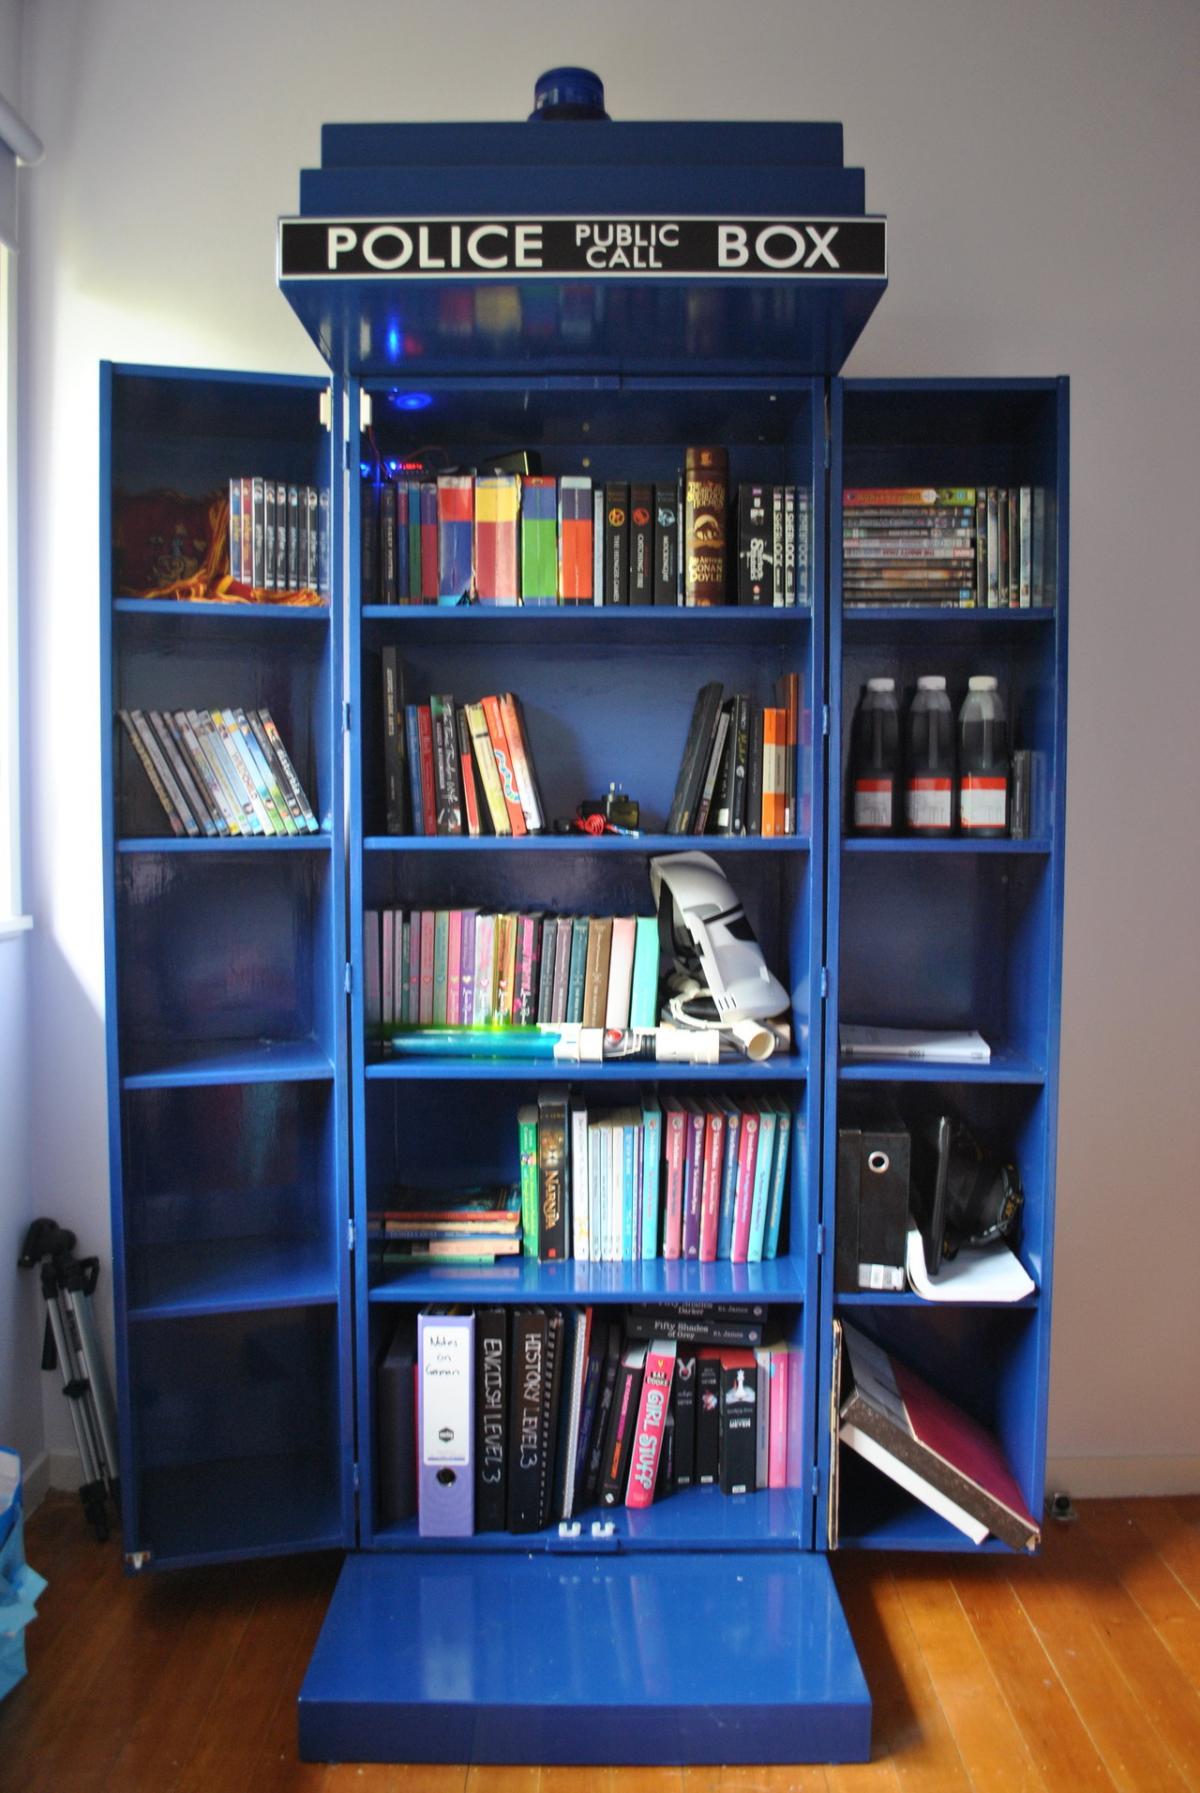 Tardis bookcase2 4jvj5P